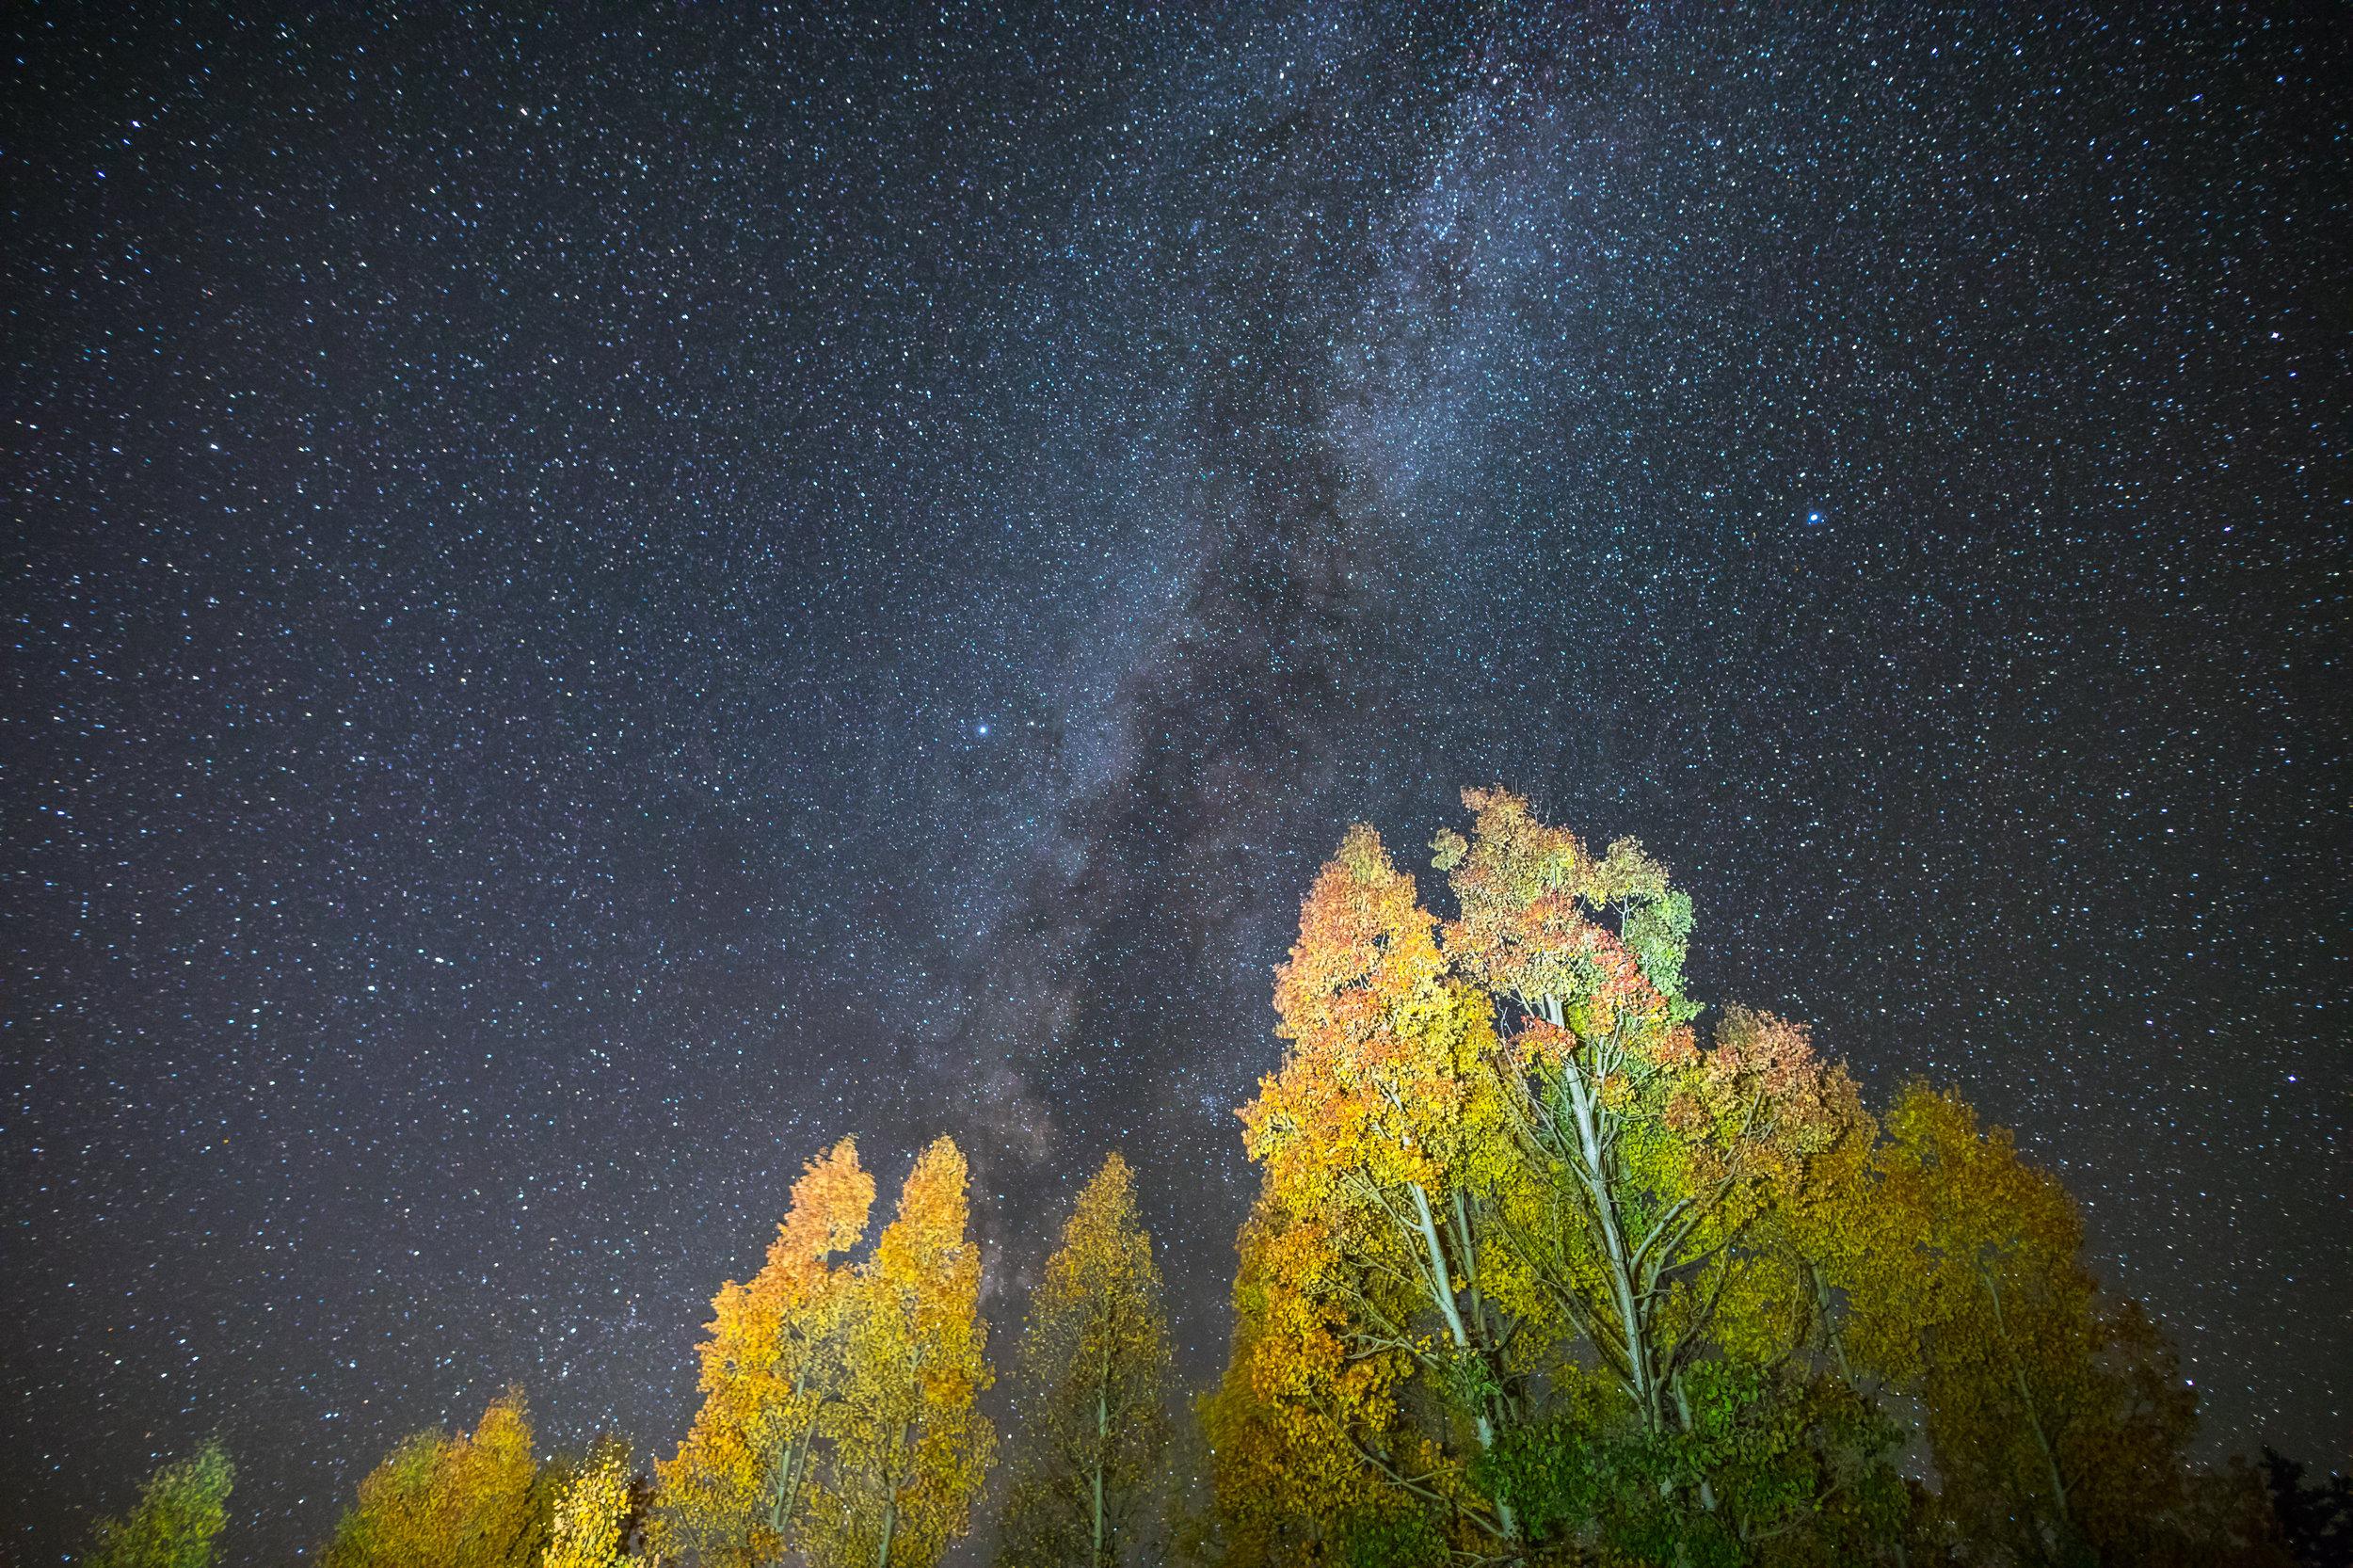 Coal Bank Pass Fall Colors and Milky Way, Image #1801